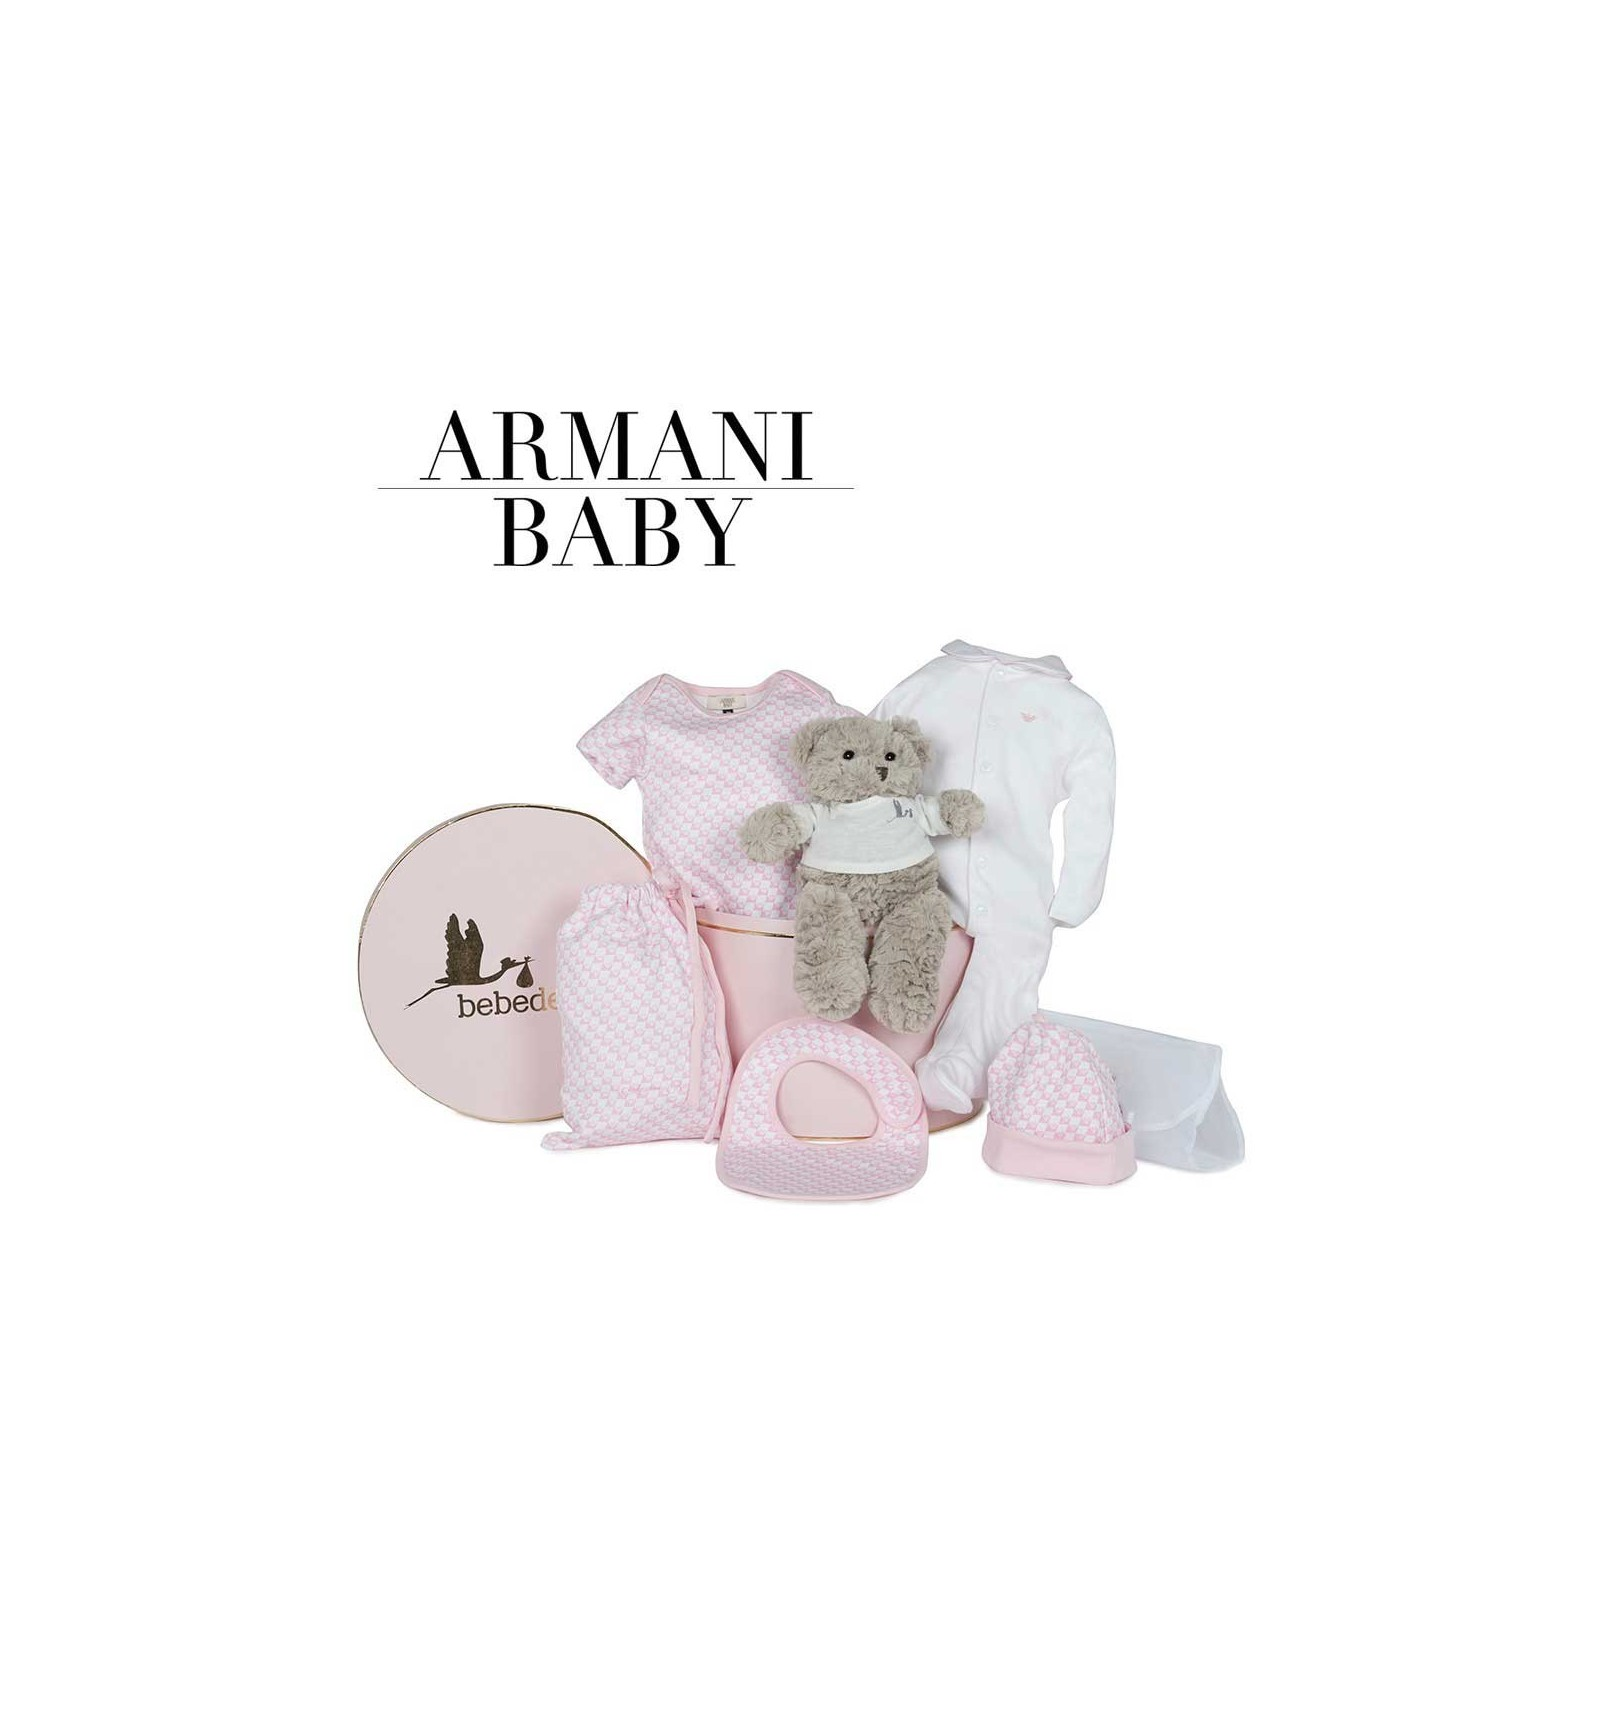 Panier naissance Armani Baby 45435d1588c